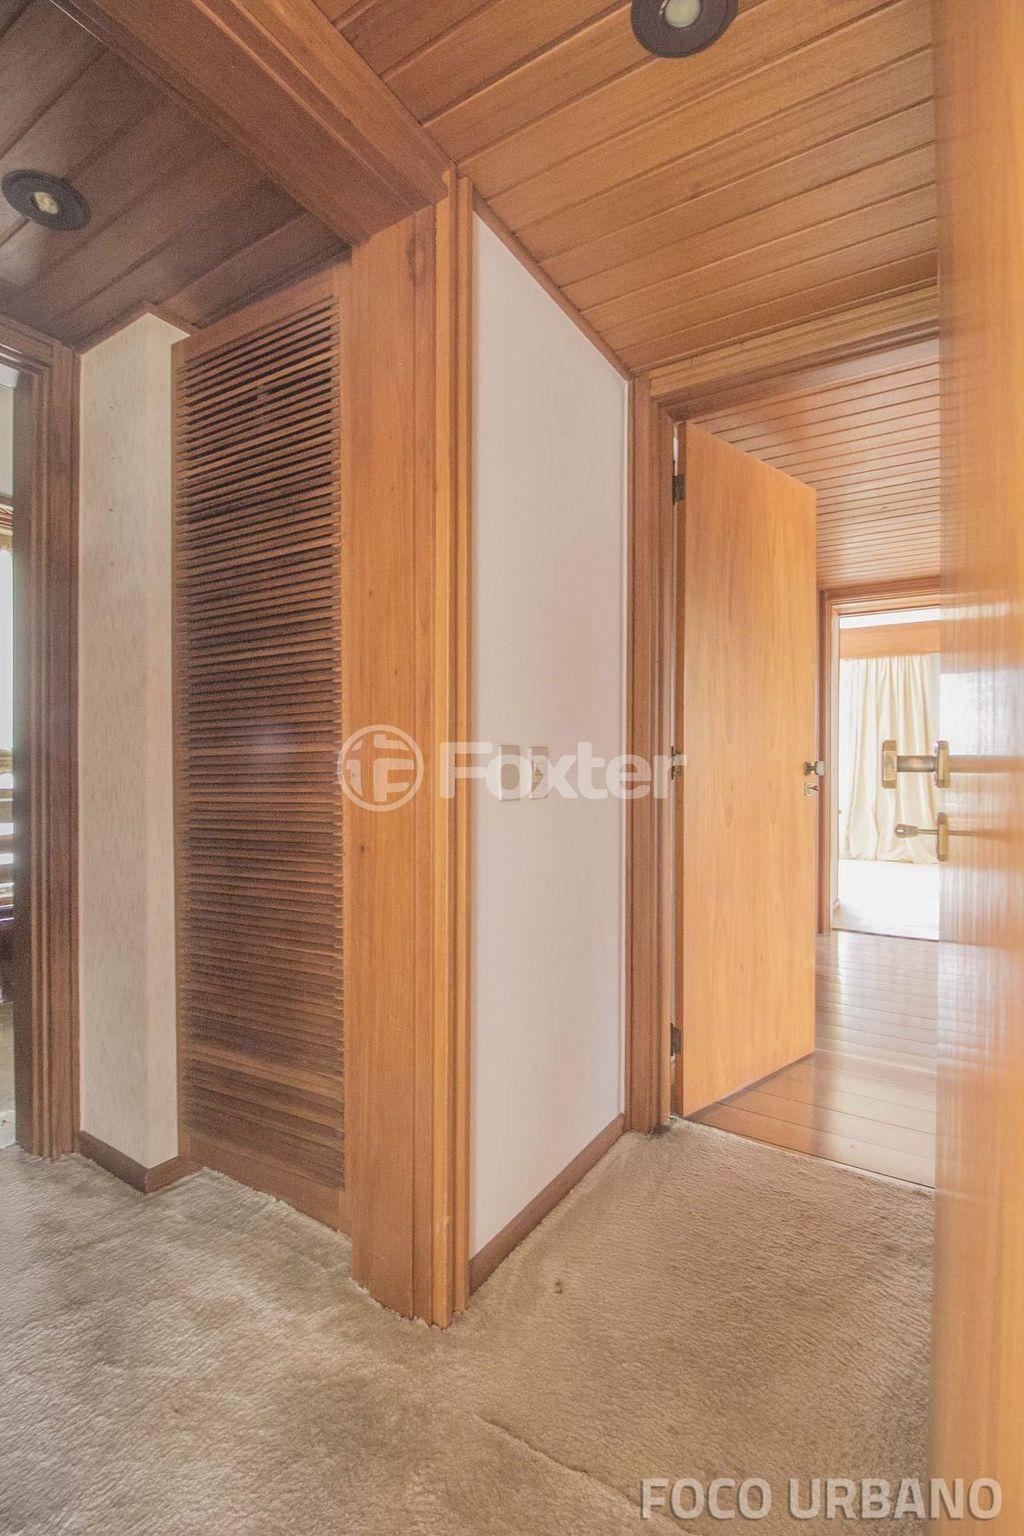 Cobertura 3 Dorm, Floresta, Porto Alegre (131891) - Foto 10